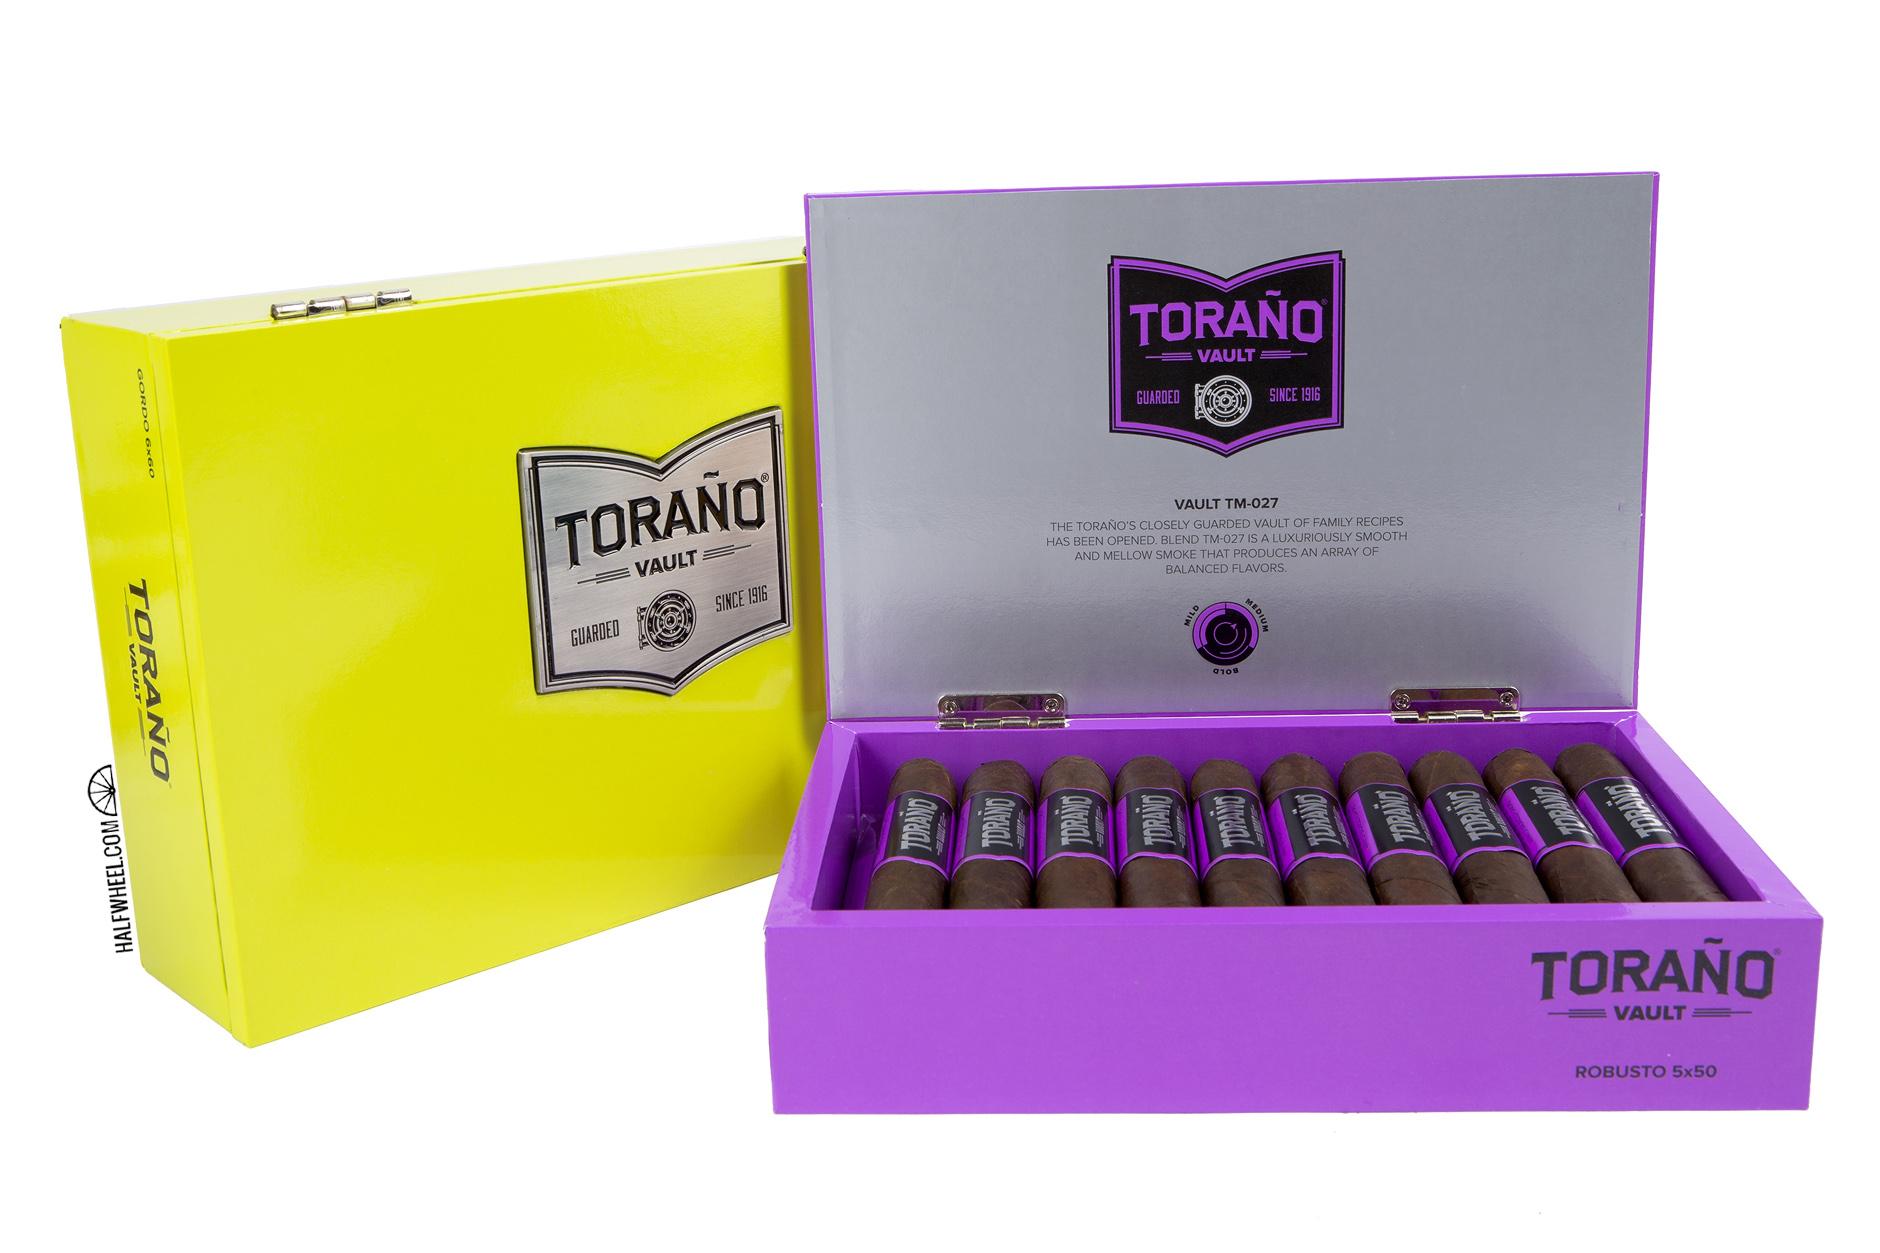 Torano Vault P-044 & Vault TM-027 boxes